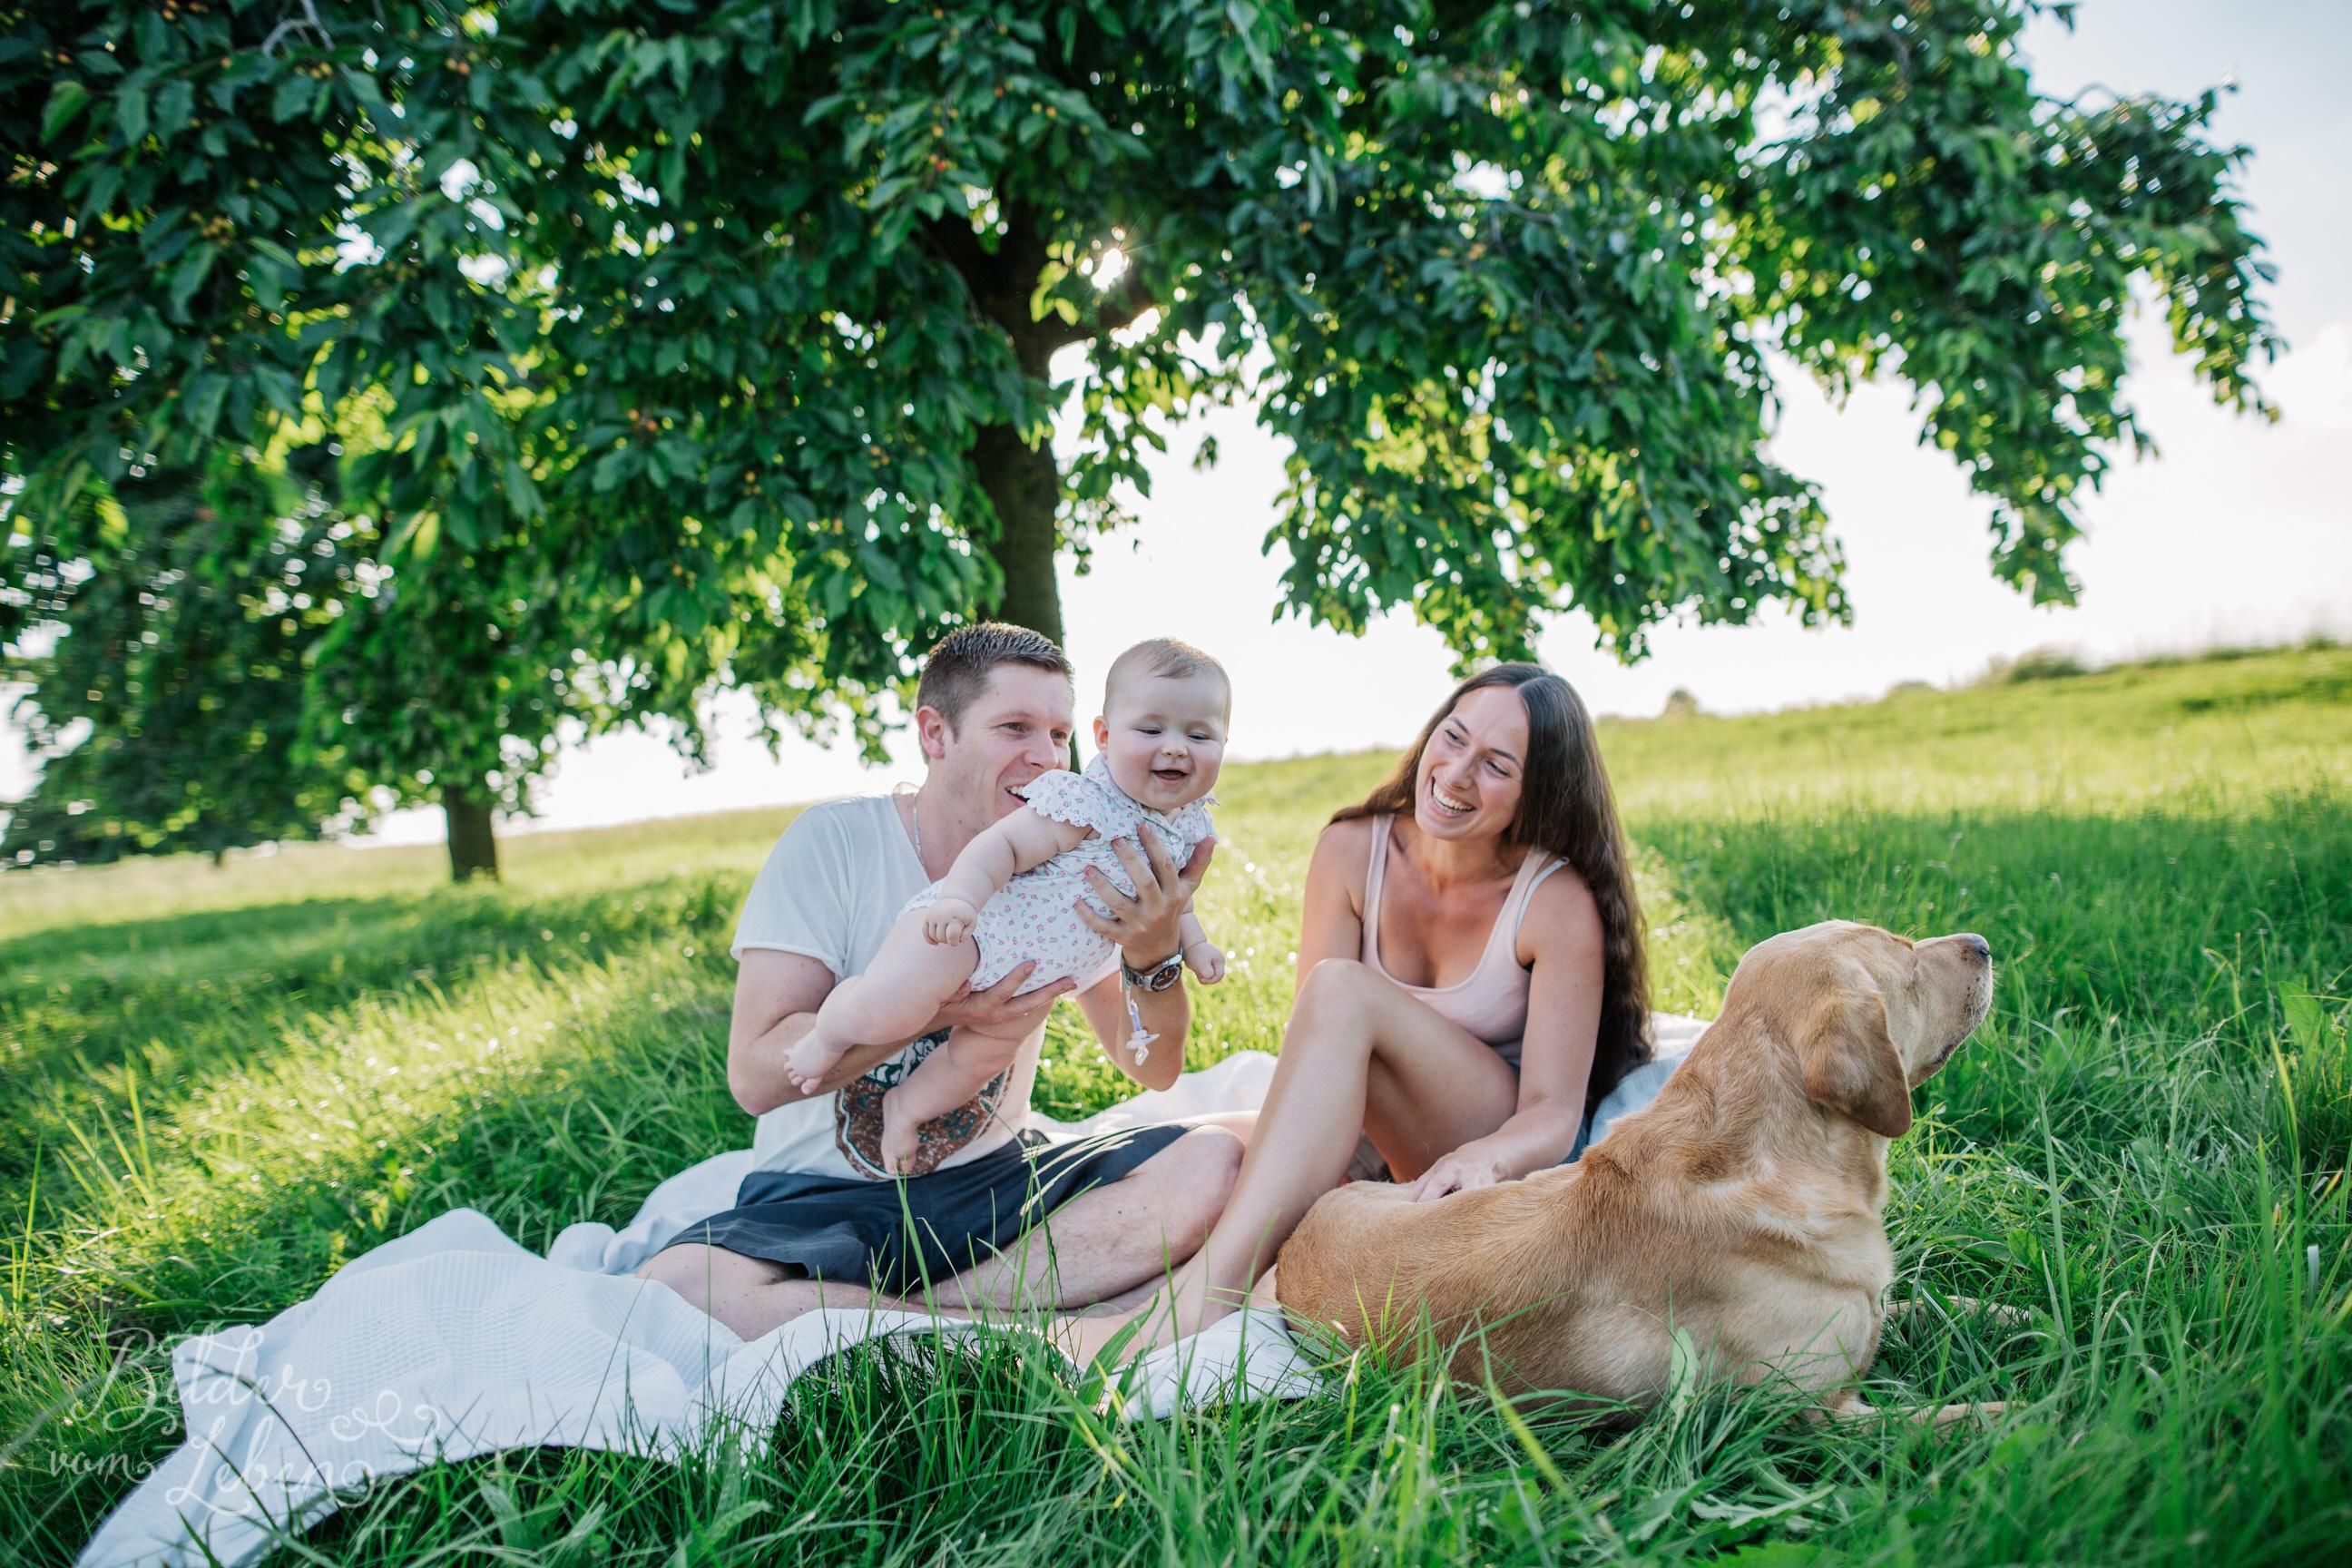 Greta-Labrador-Kinder-Portraits-BildervomLeben-2016-8038